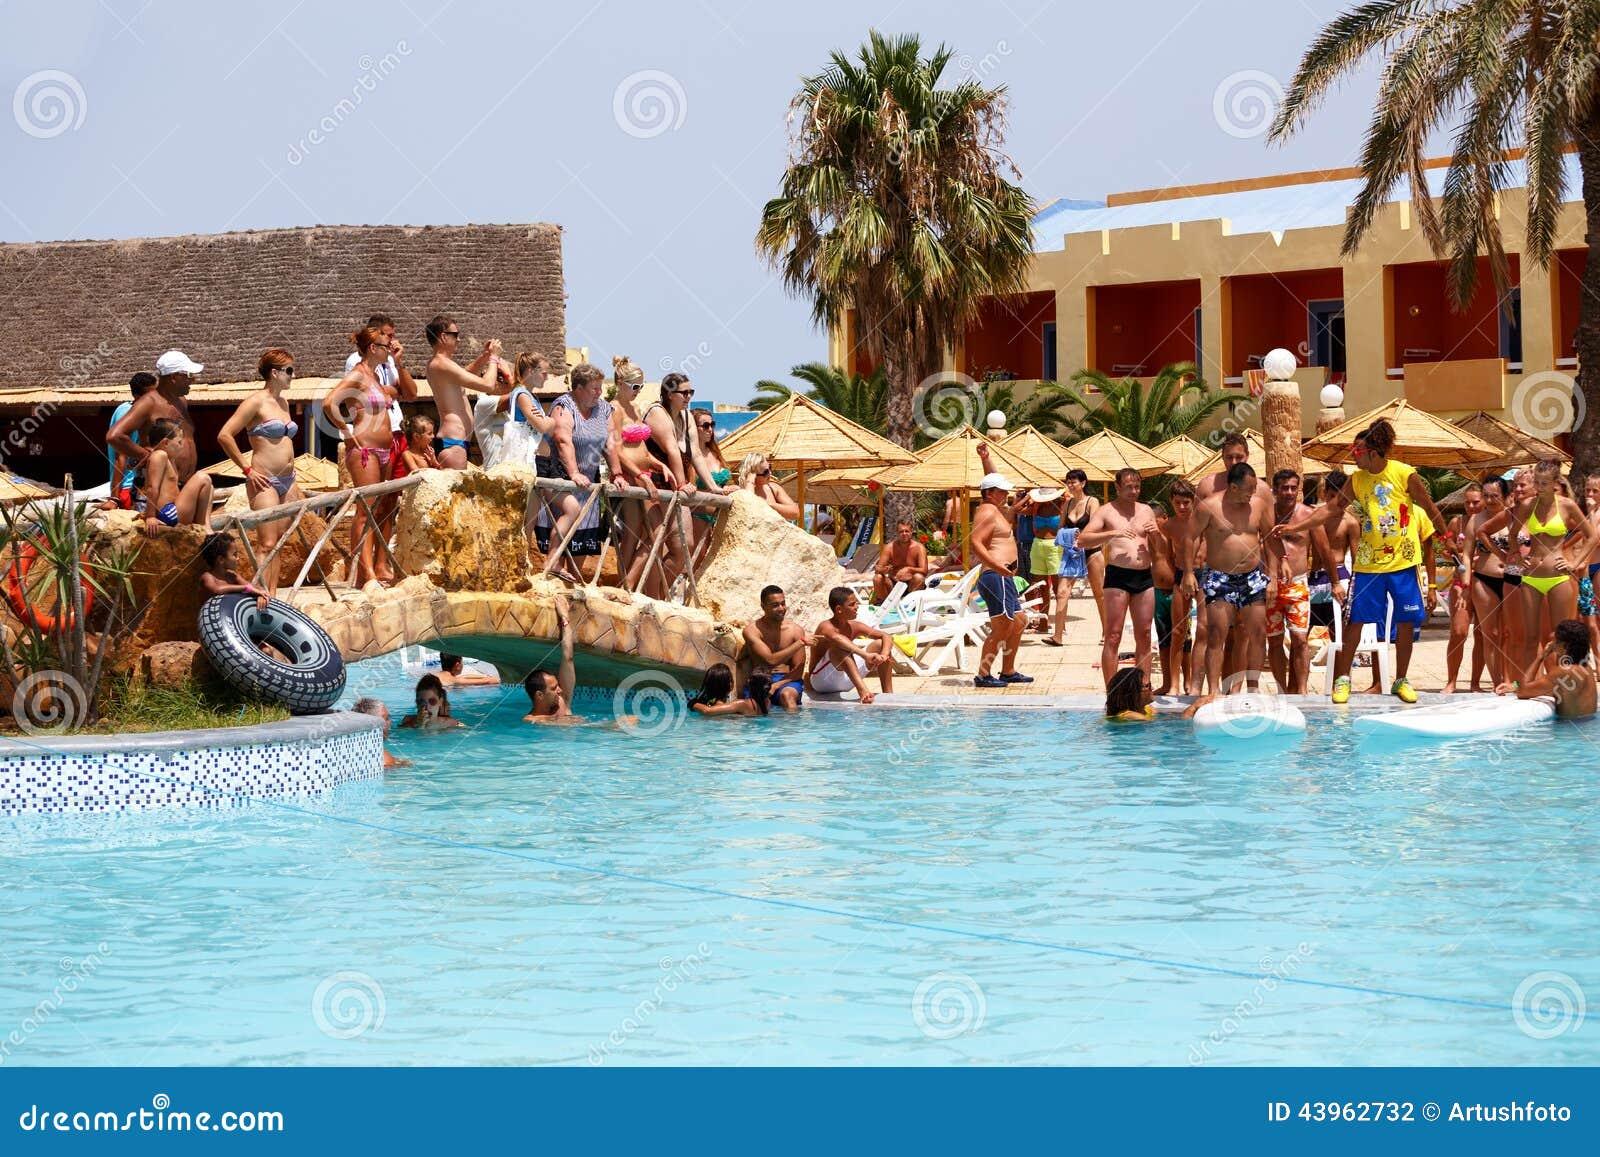 Borj Cedria Tunisia  city photos : BORJ CEDRIA, TUNISIA AUGUST 5: Tourists in animation competition ...